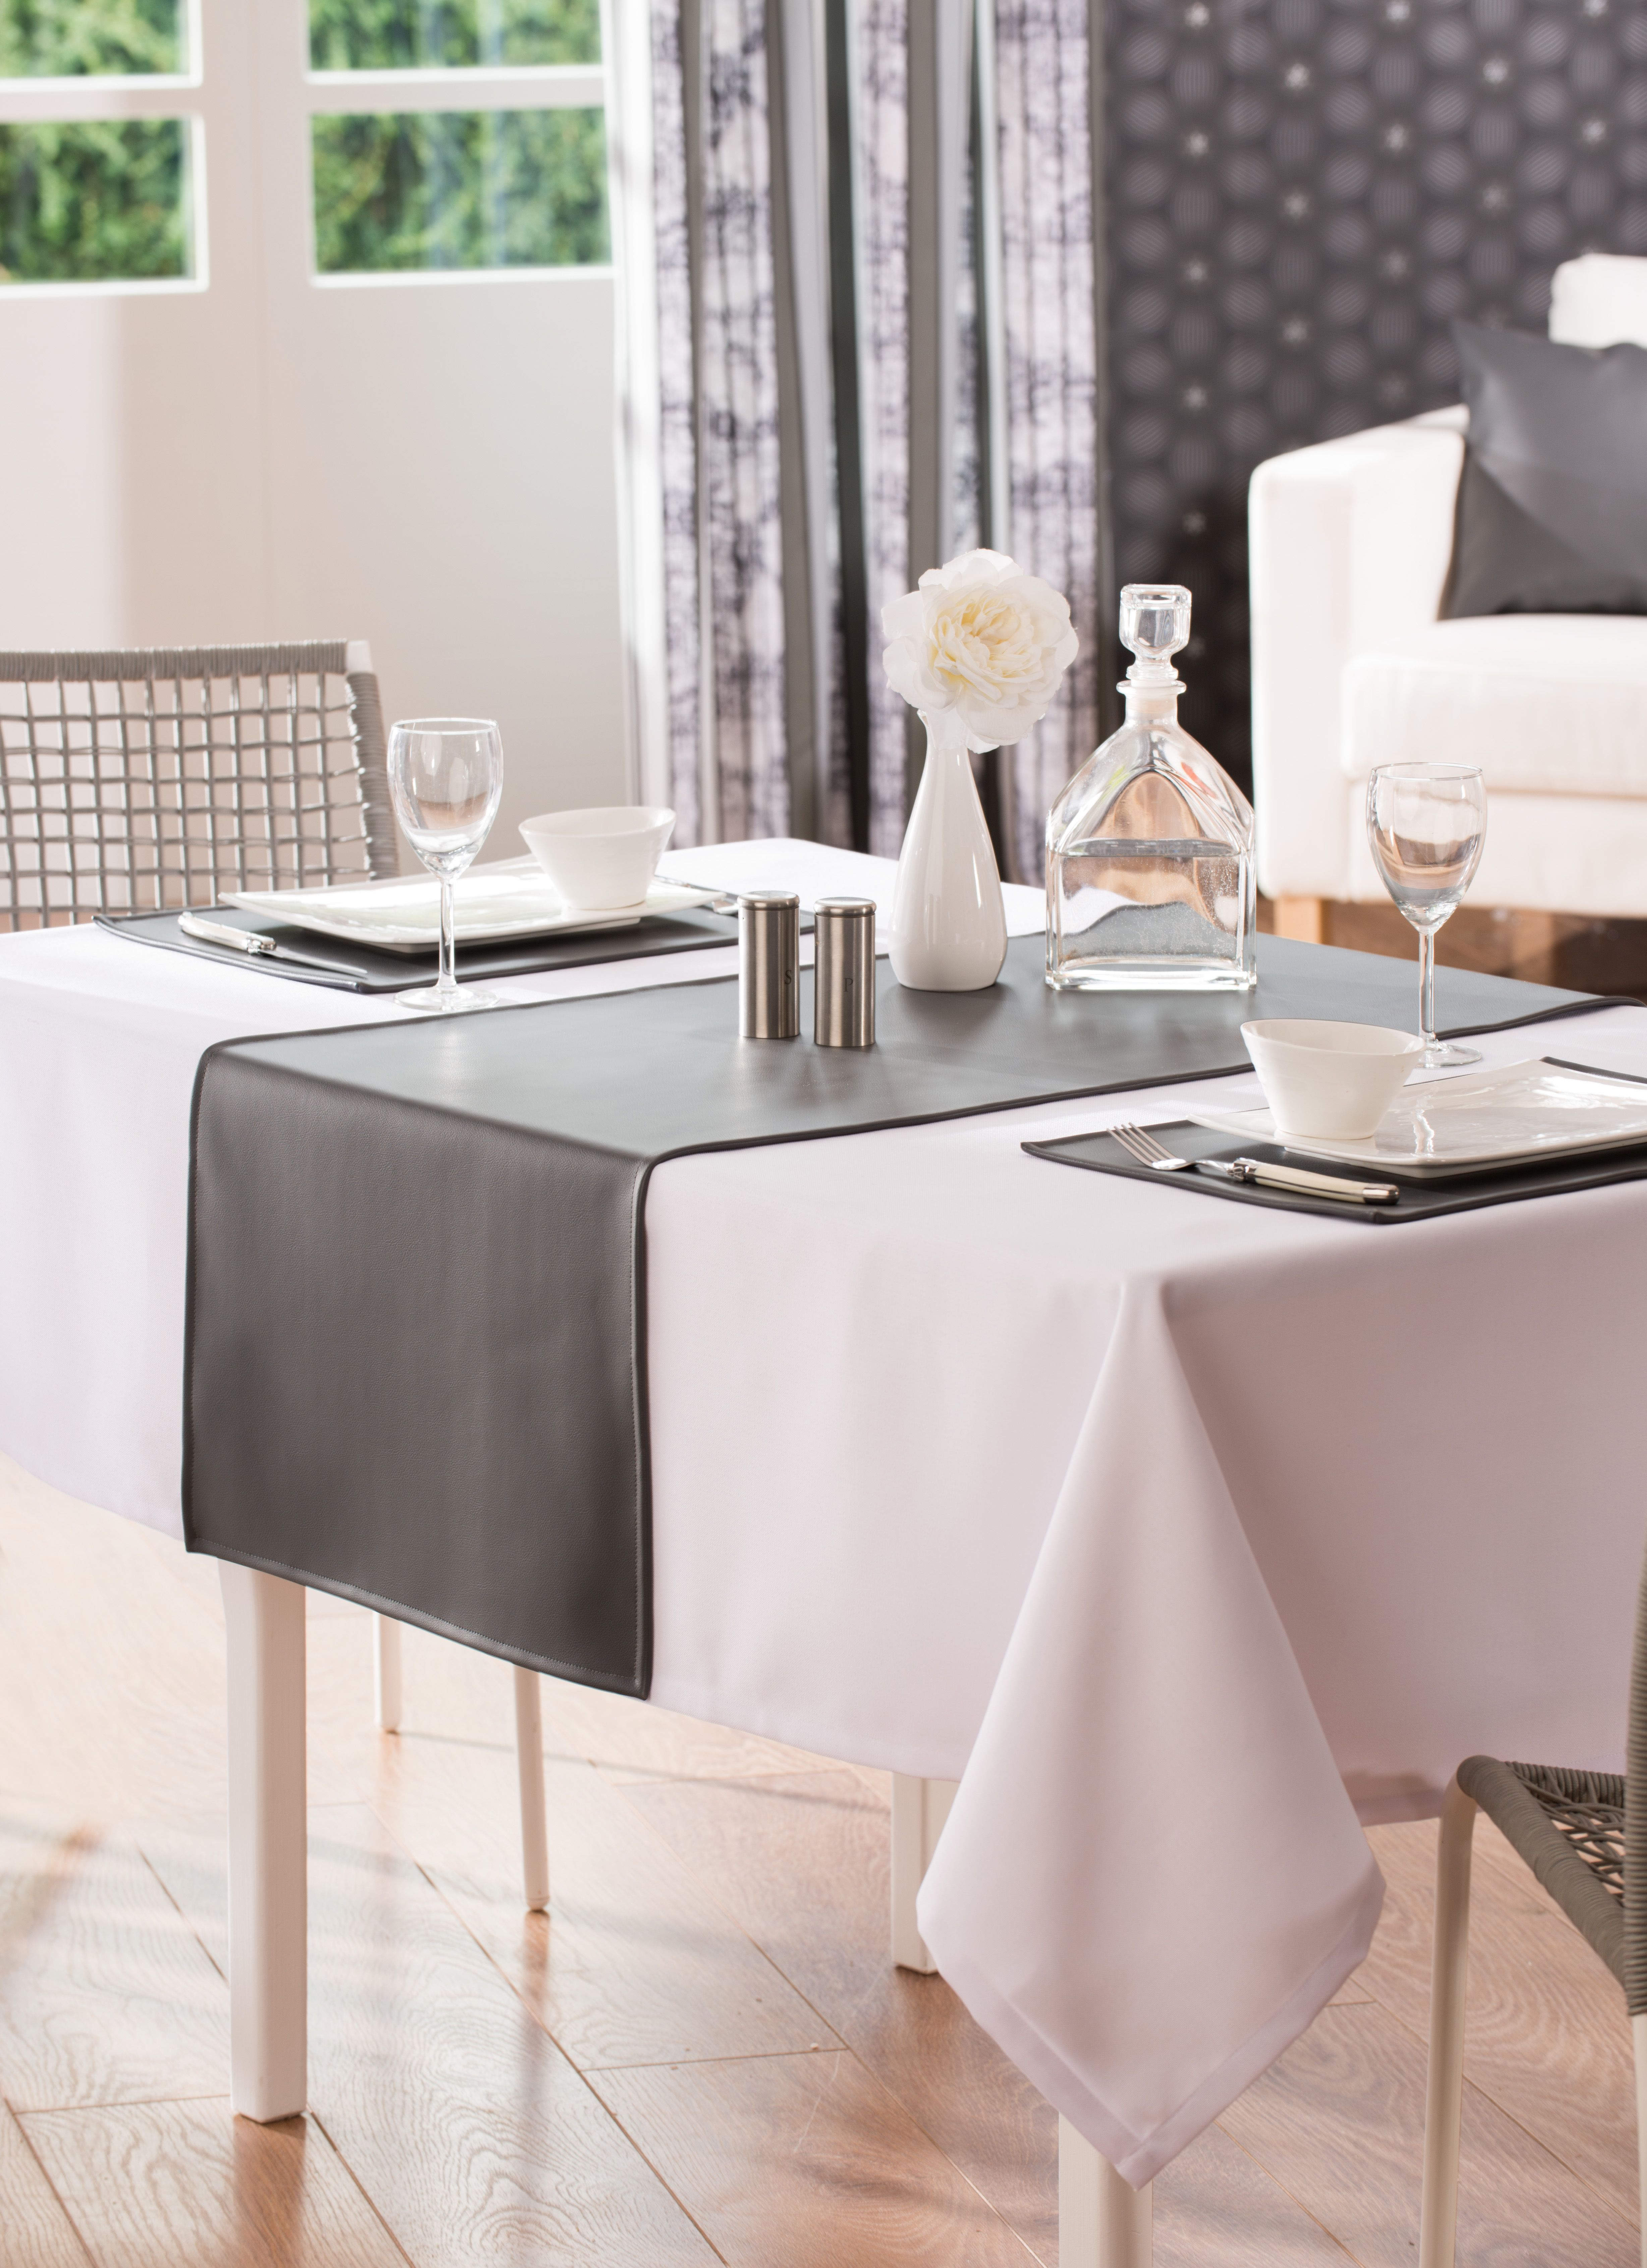 Chemin De Table Spirit Simili Cuir Simili Cuir Table Linge De Table